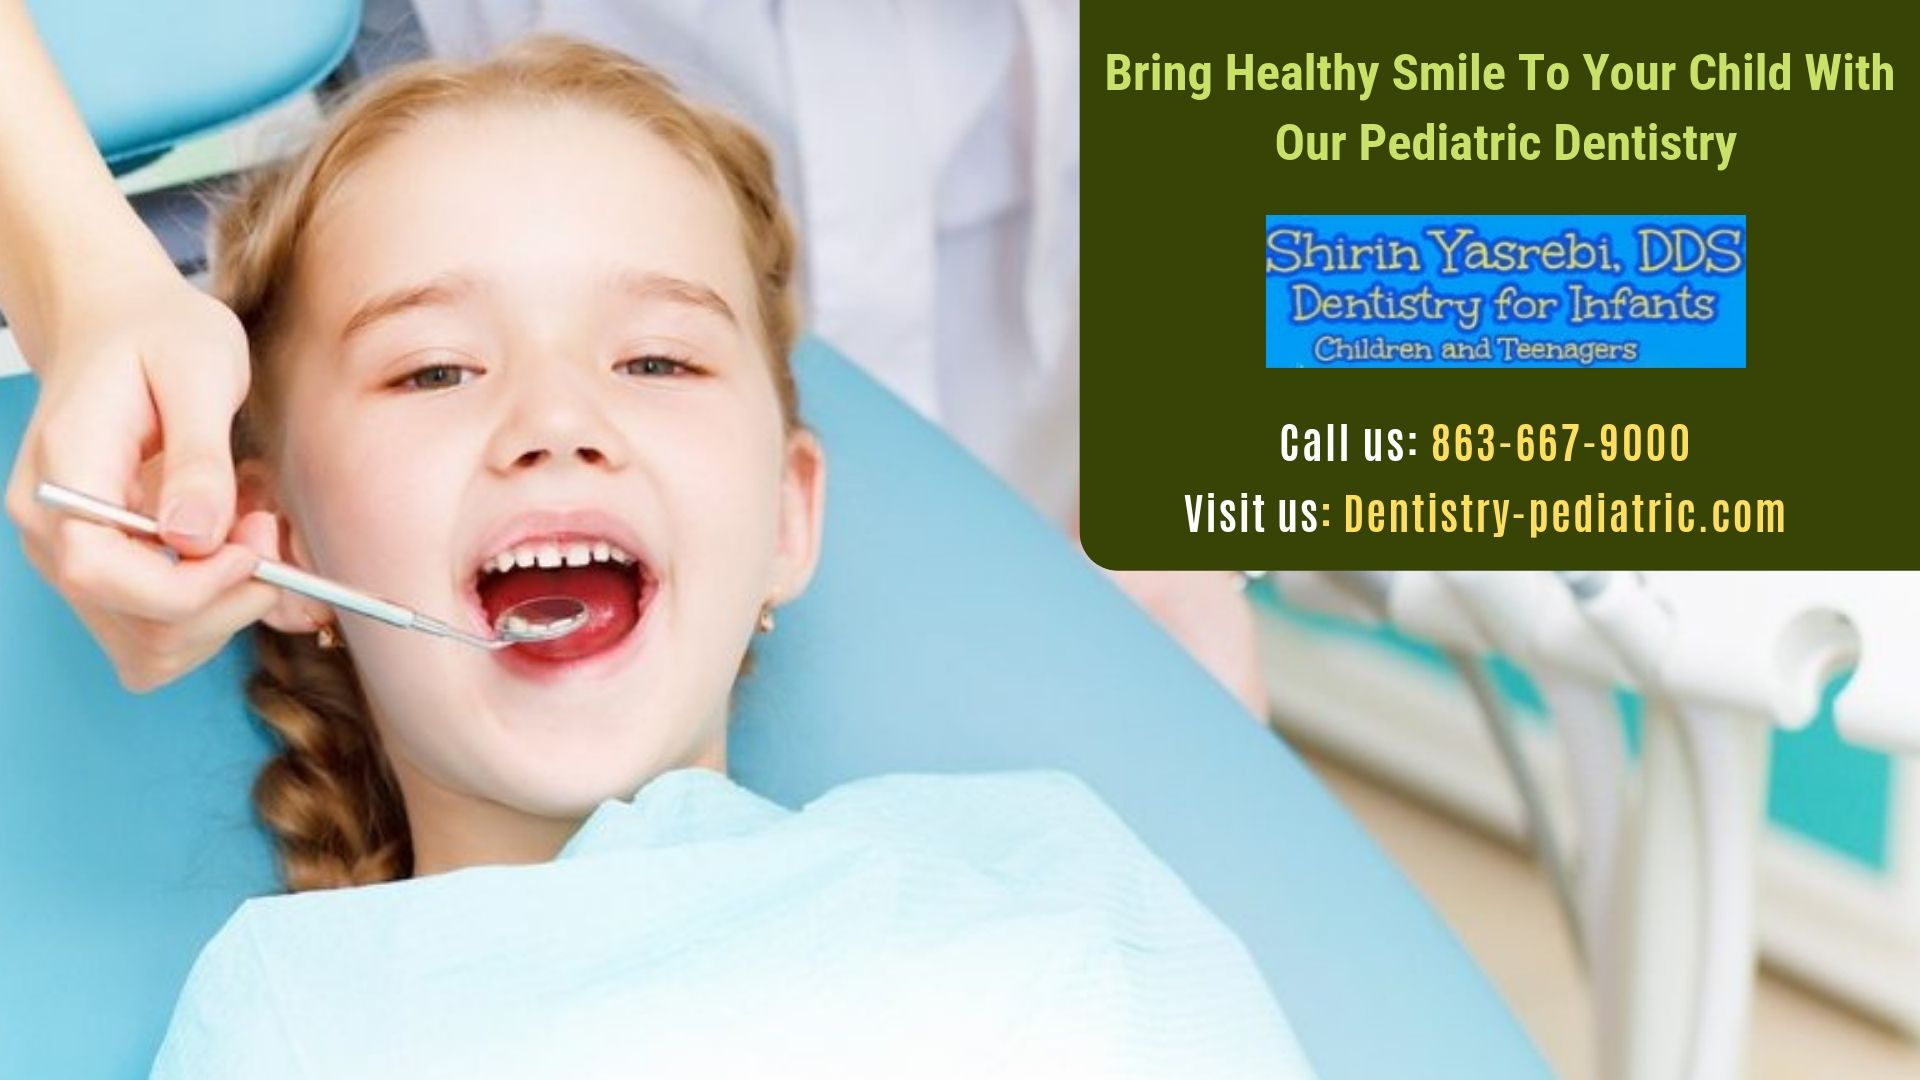 lakeland health department dental